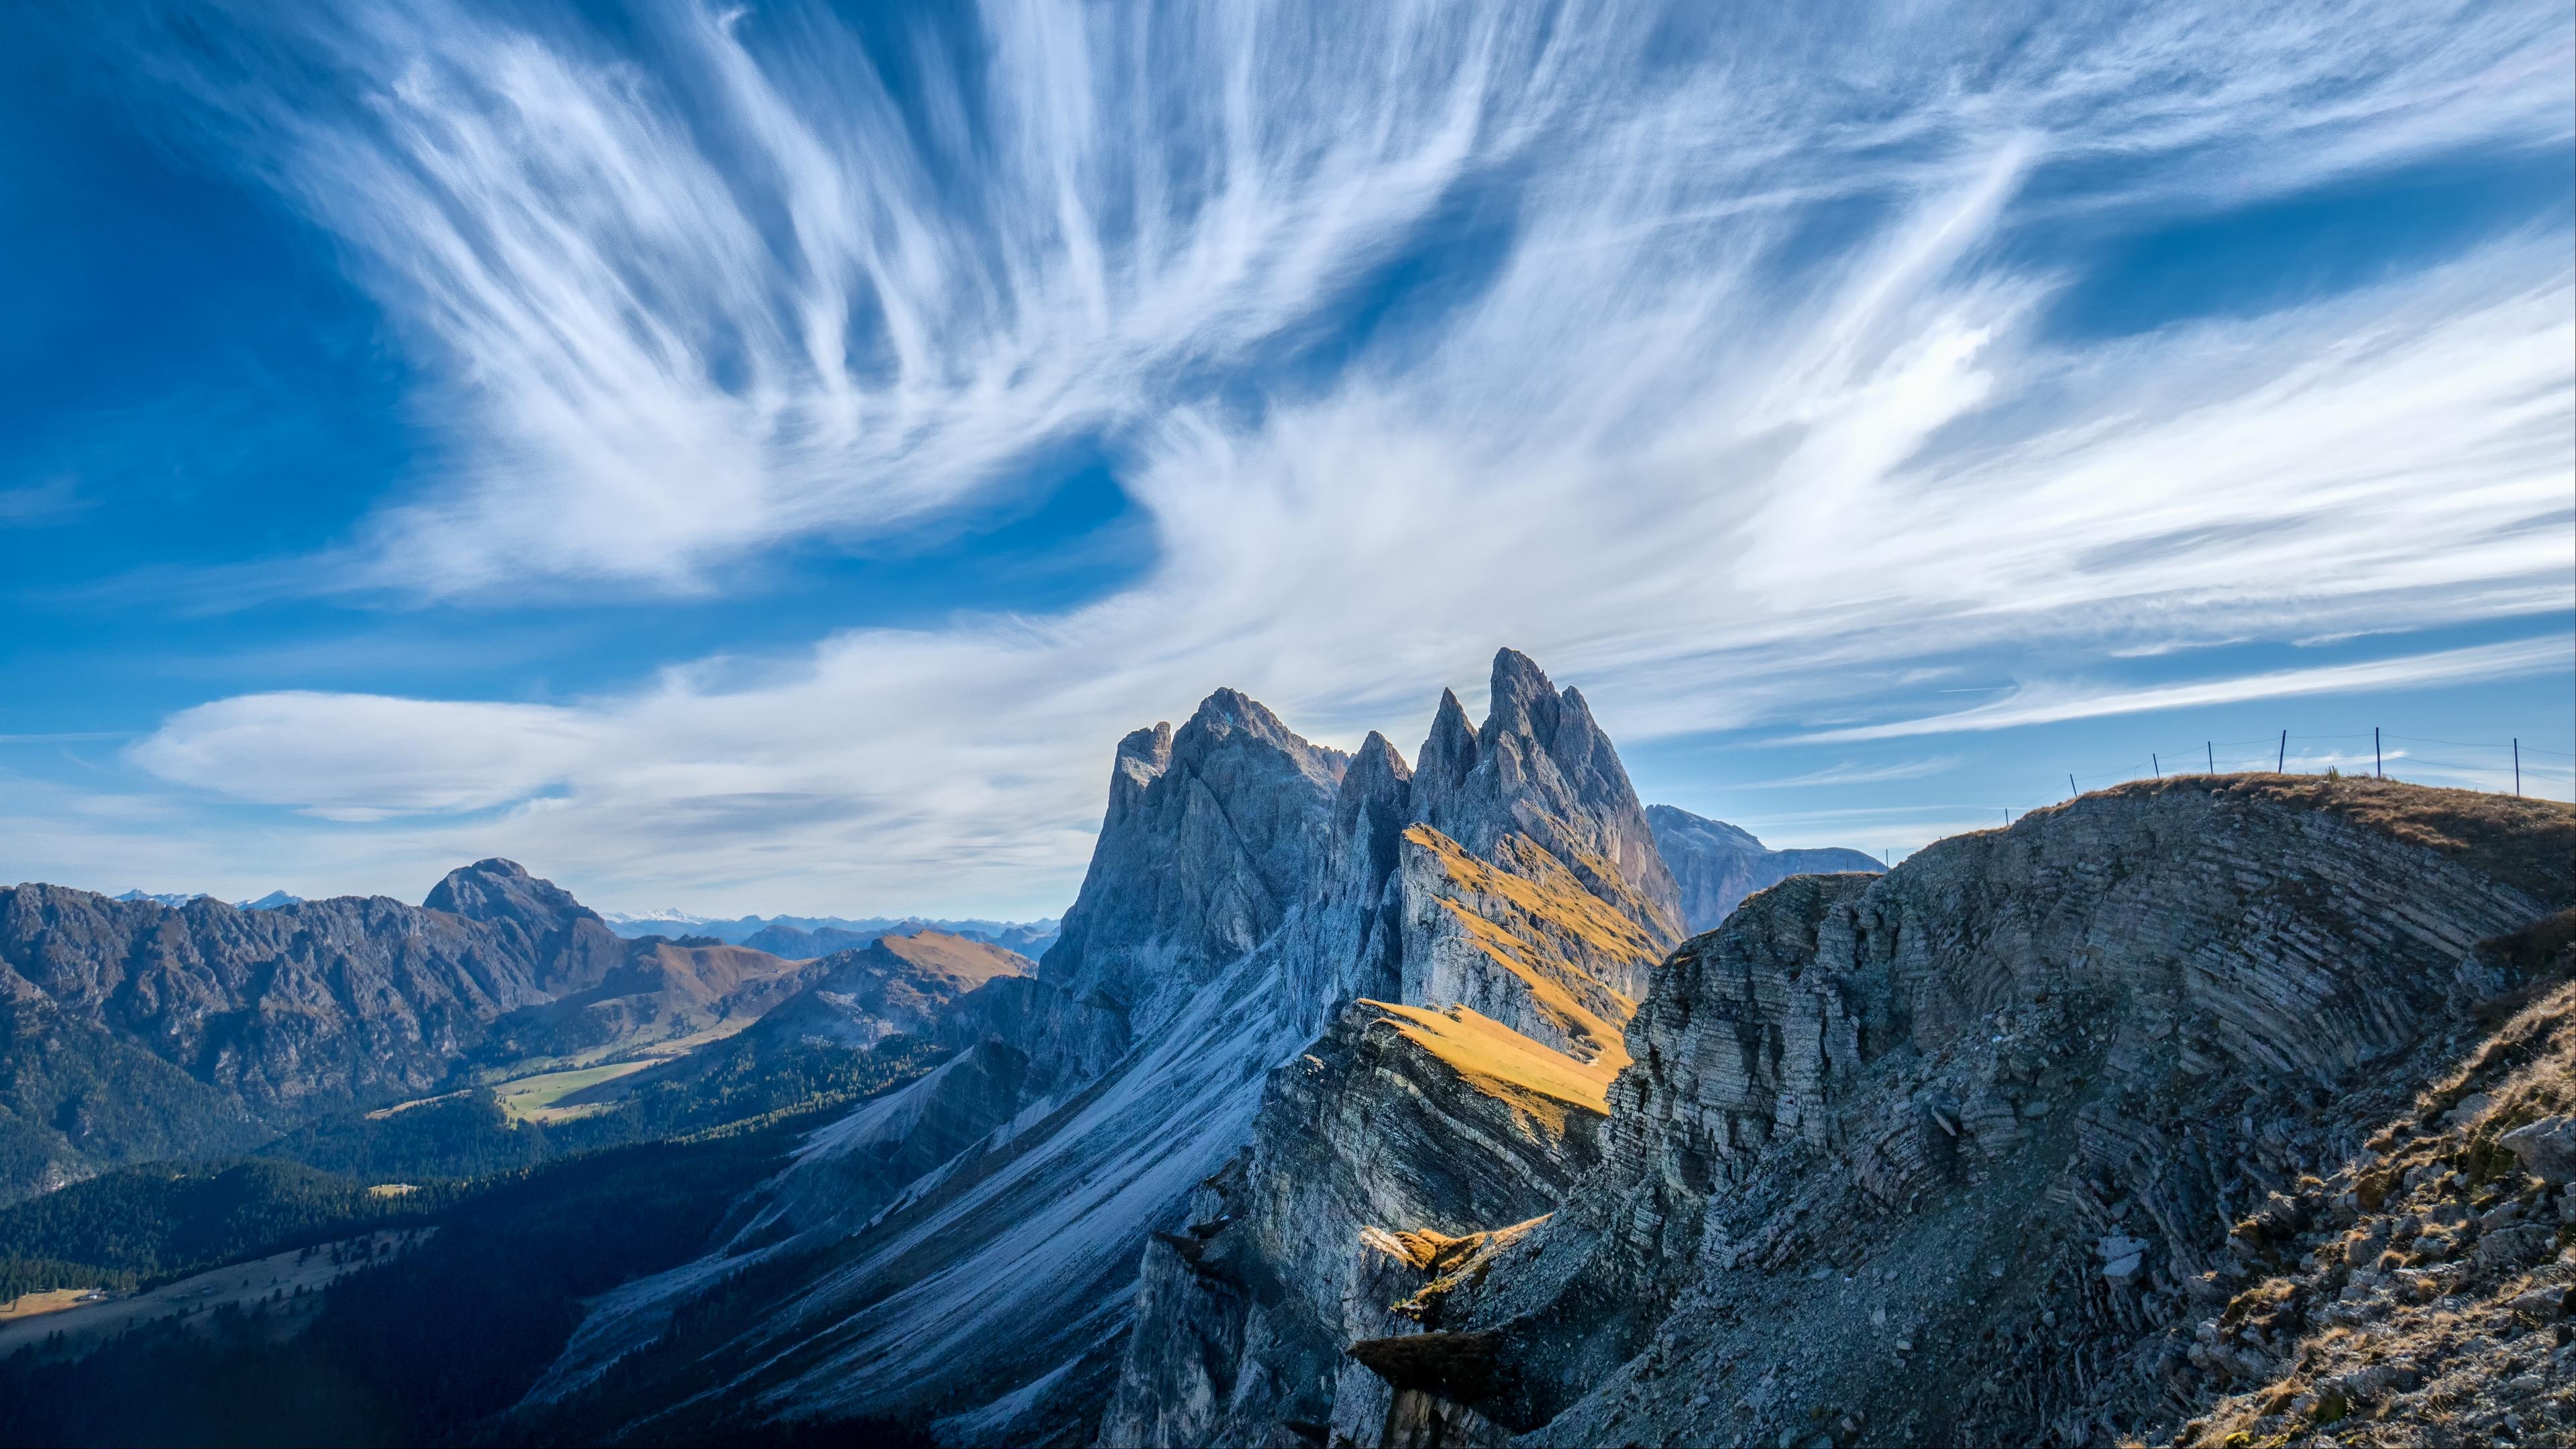 italy mountains cliffs clouds dolomites 4k 1541117452 - italy, mountains, cliffs, clouds, dolomites 4k - Mountains, Italy, cliffs